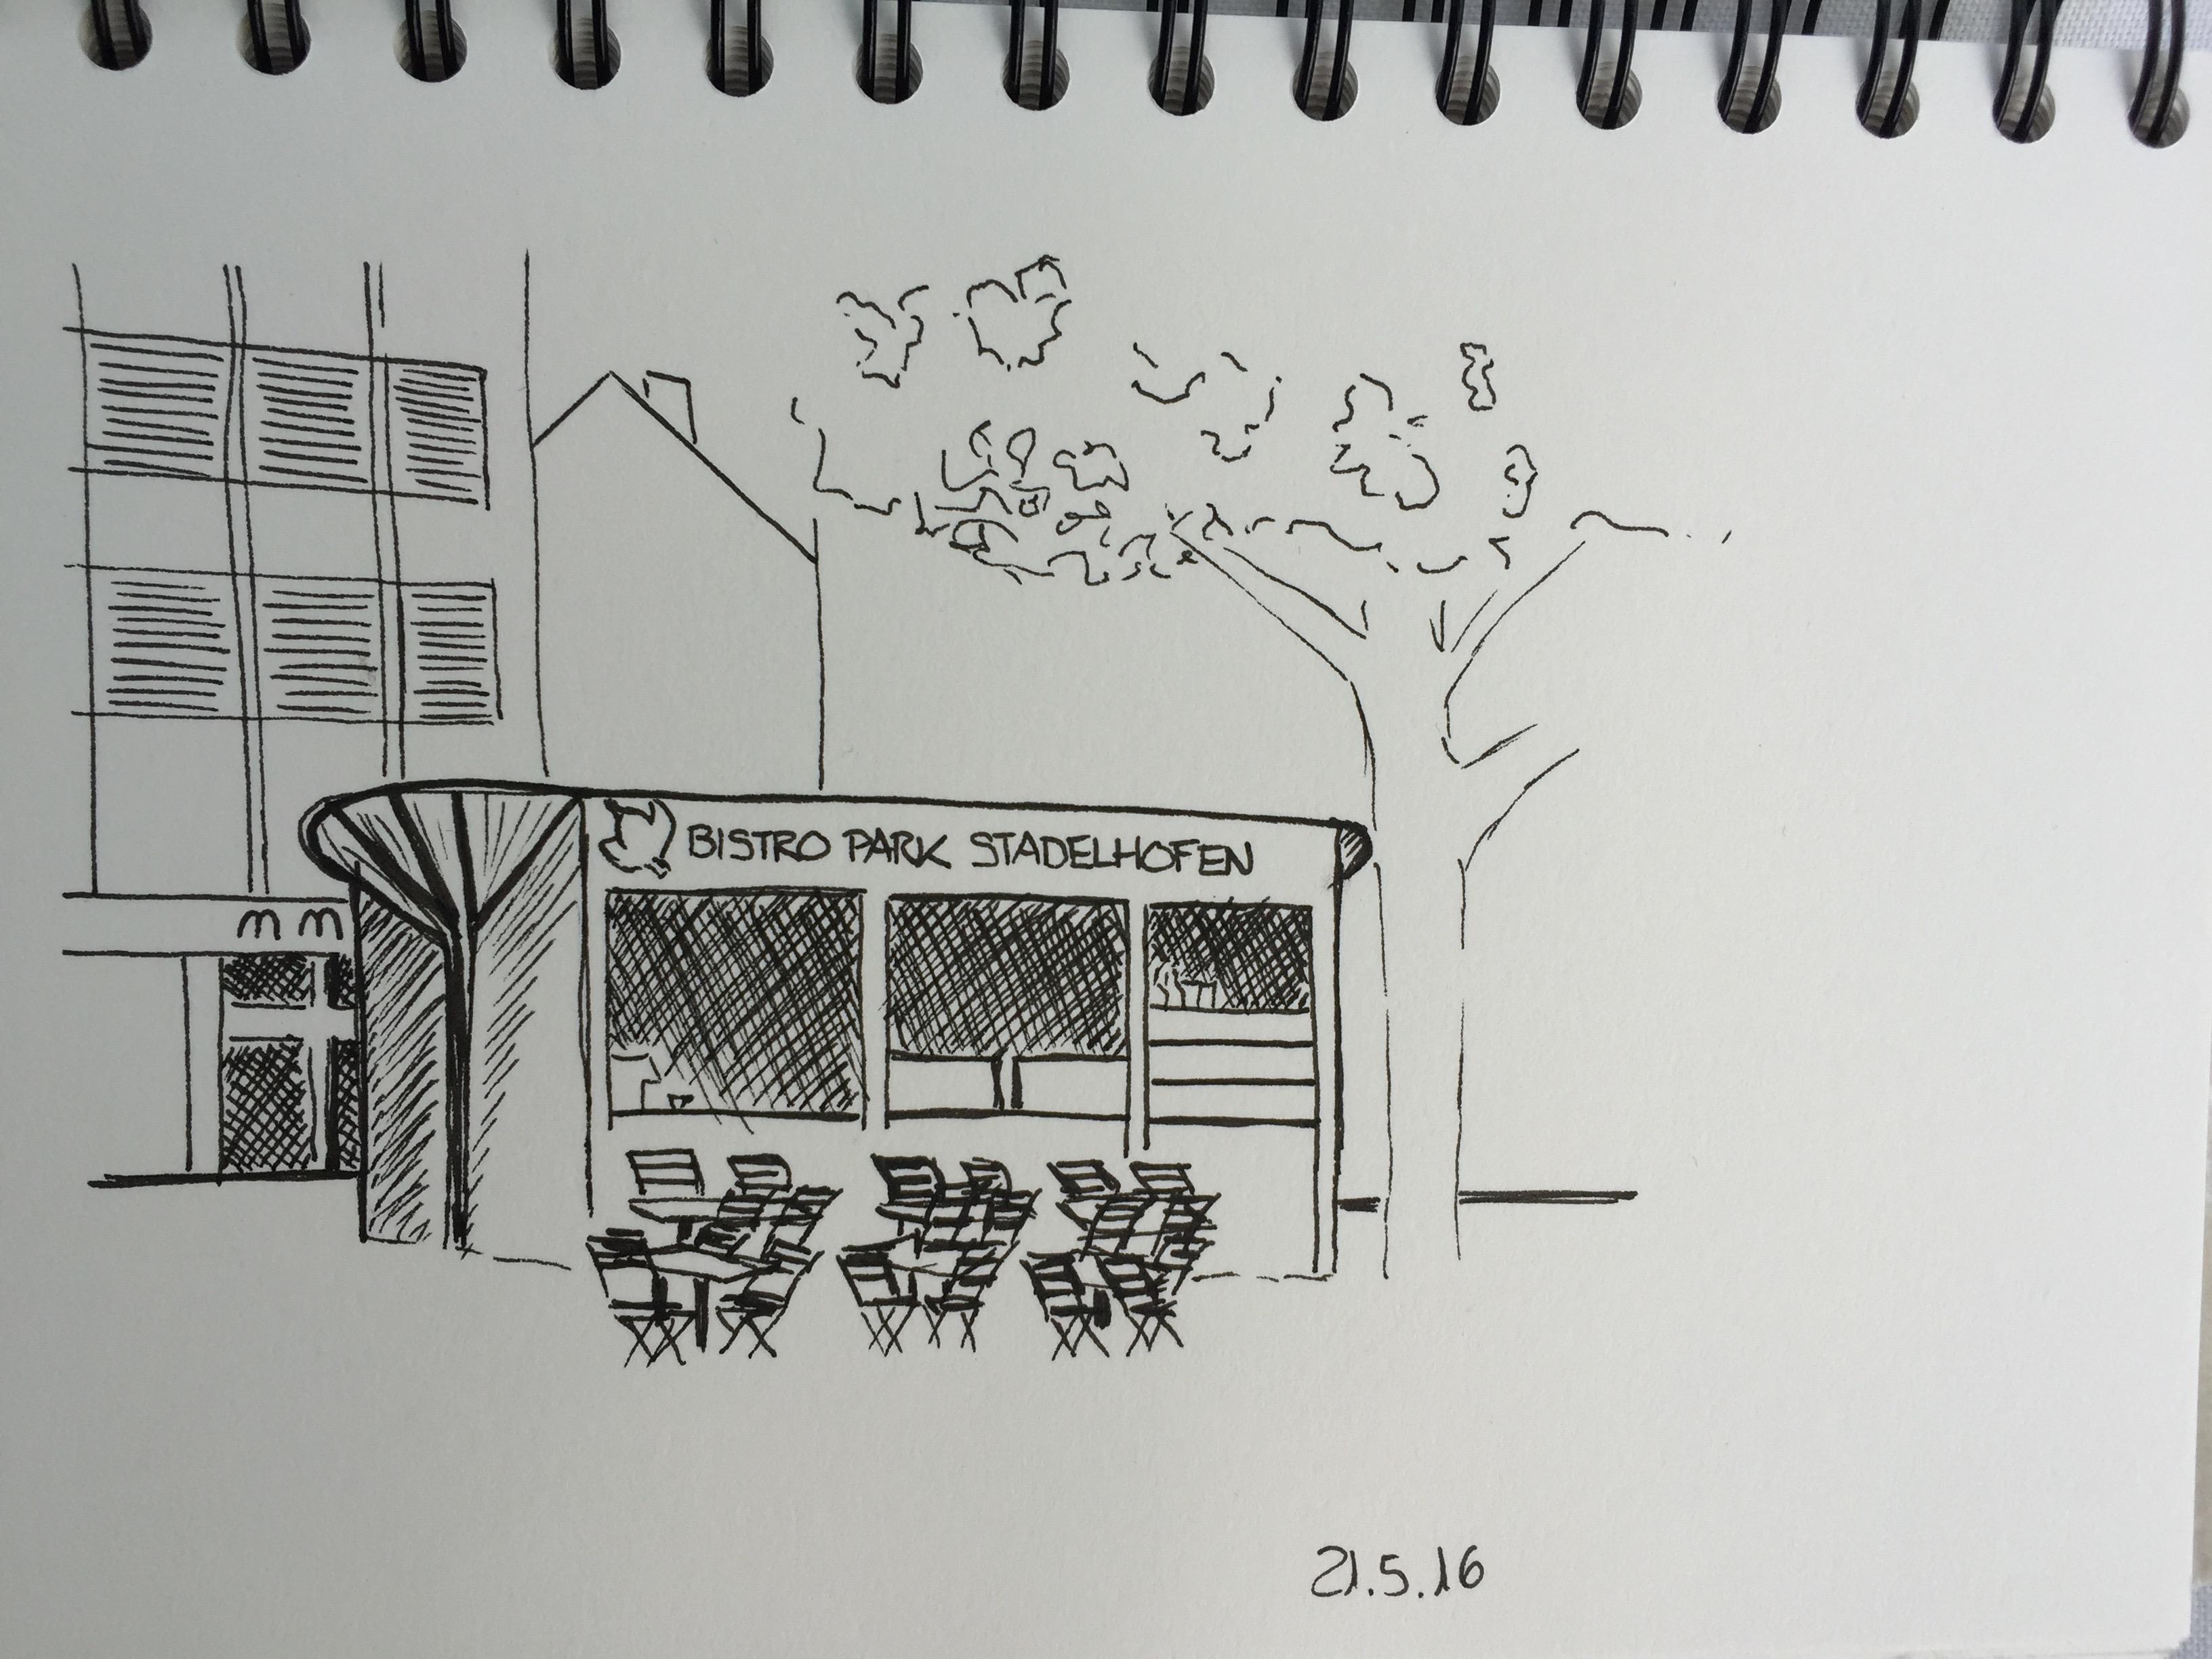 Petra Palm, Park Stadelhofen, Stadelhofen,Astrid Amadeo, Urban Sketching, Blogg,